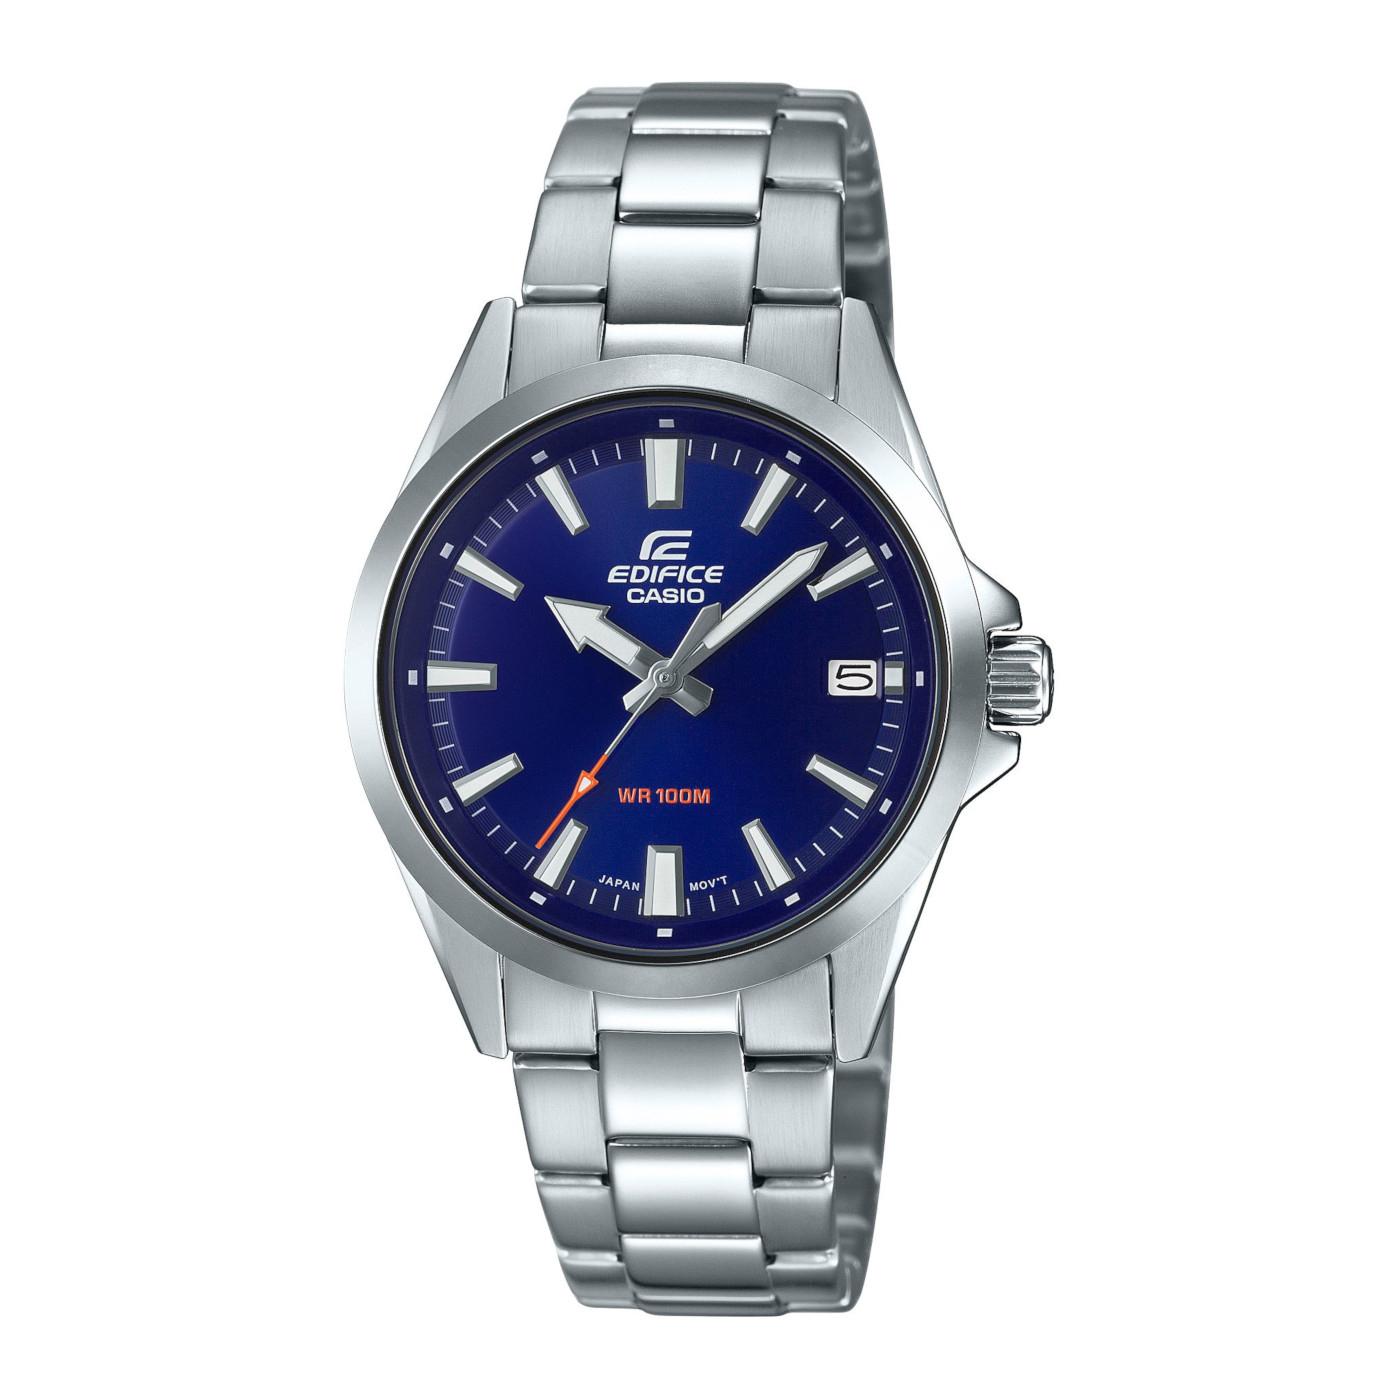 Afbeelding van Edifice Classic horloge EFV 110D 2AVUEF